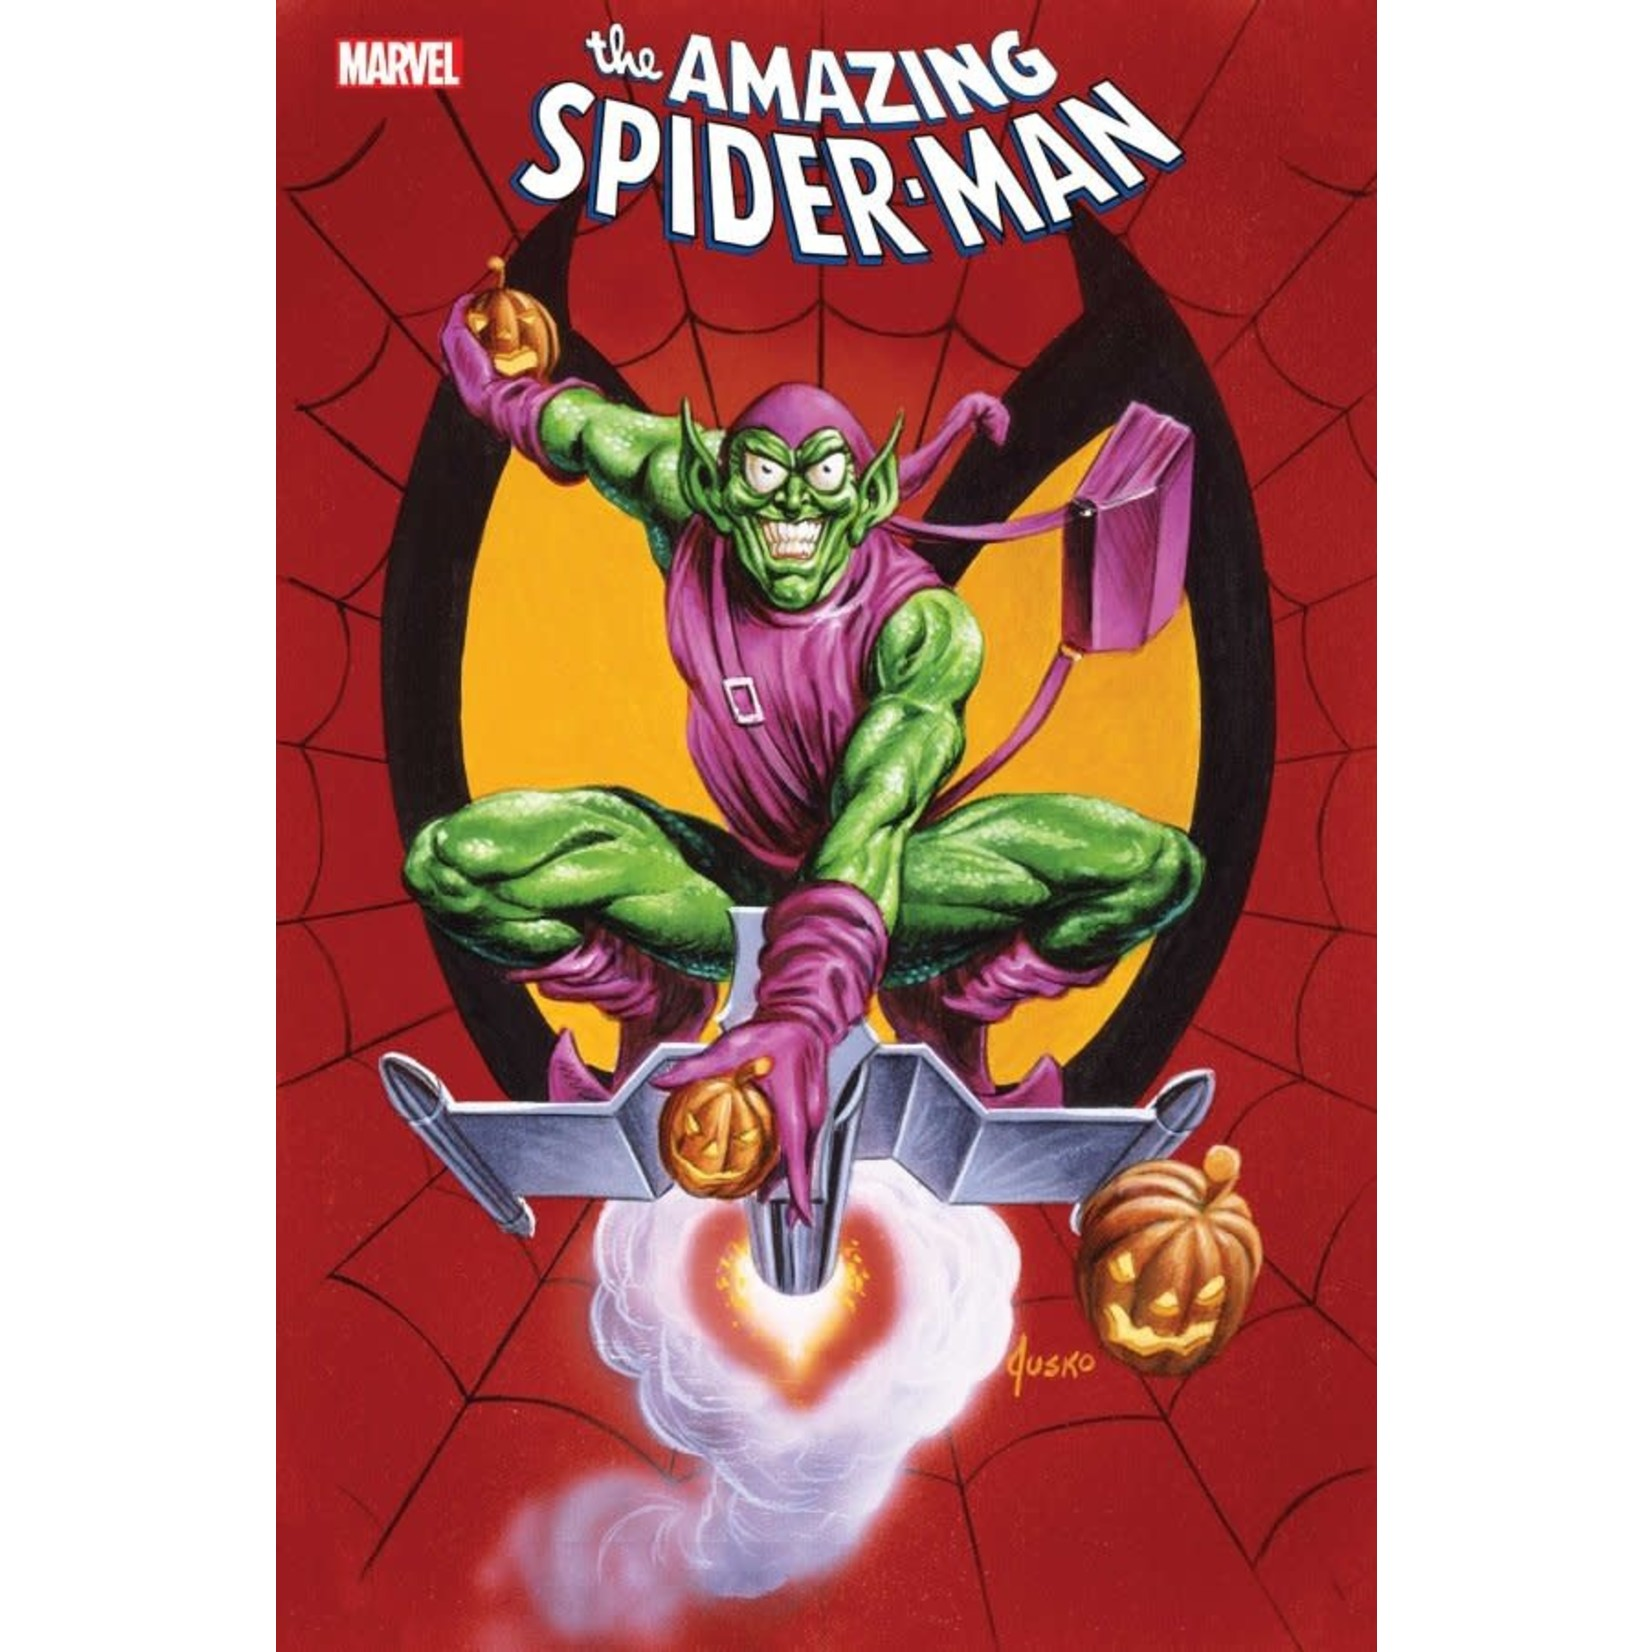 The Amazing Spider-Man #76 Jusko Marvel Masterpieces Variant